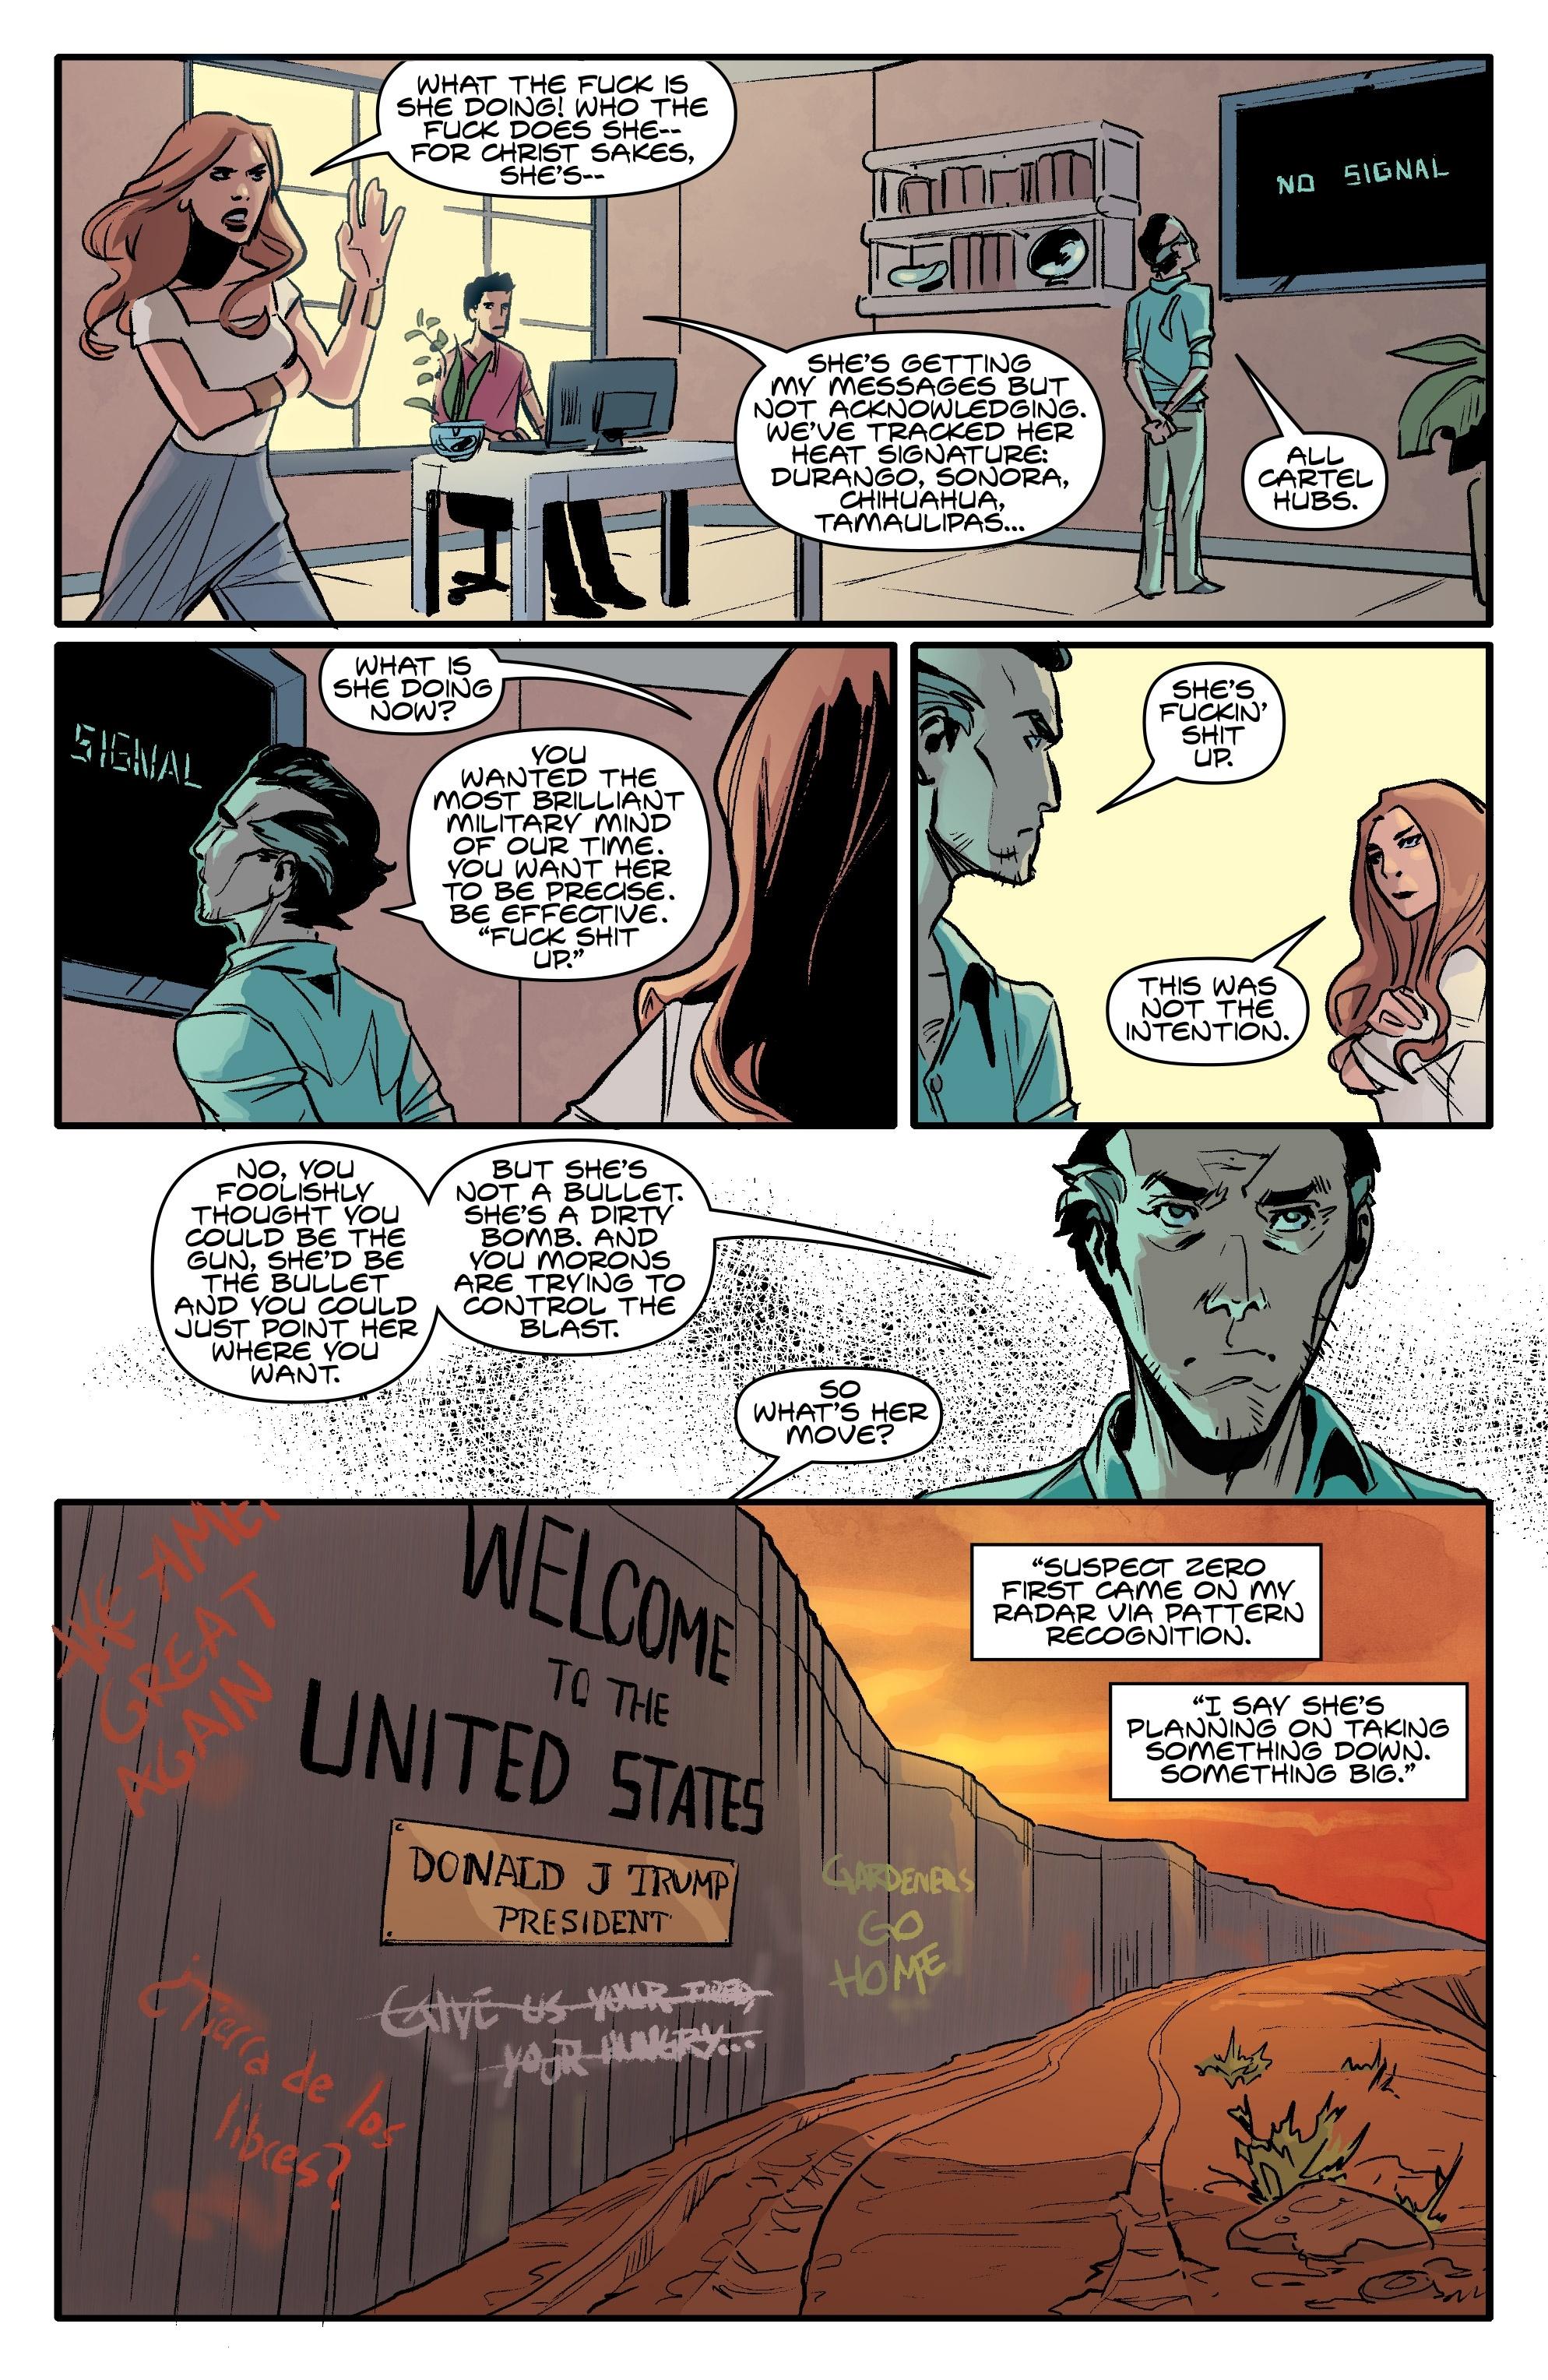 天才:卡特尔(2017): Chapter 5 - Page 天才:卡特尔(2017)